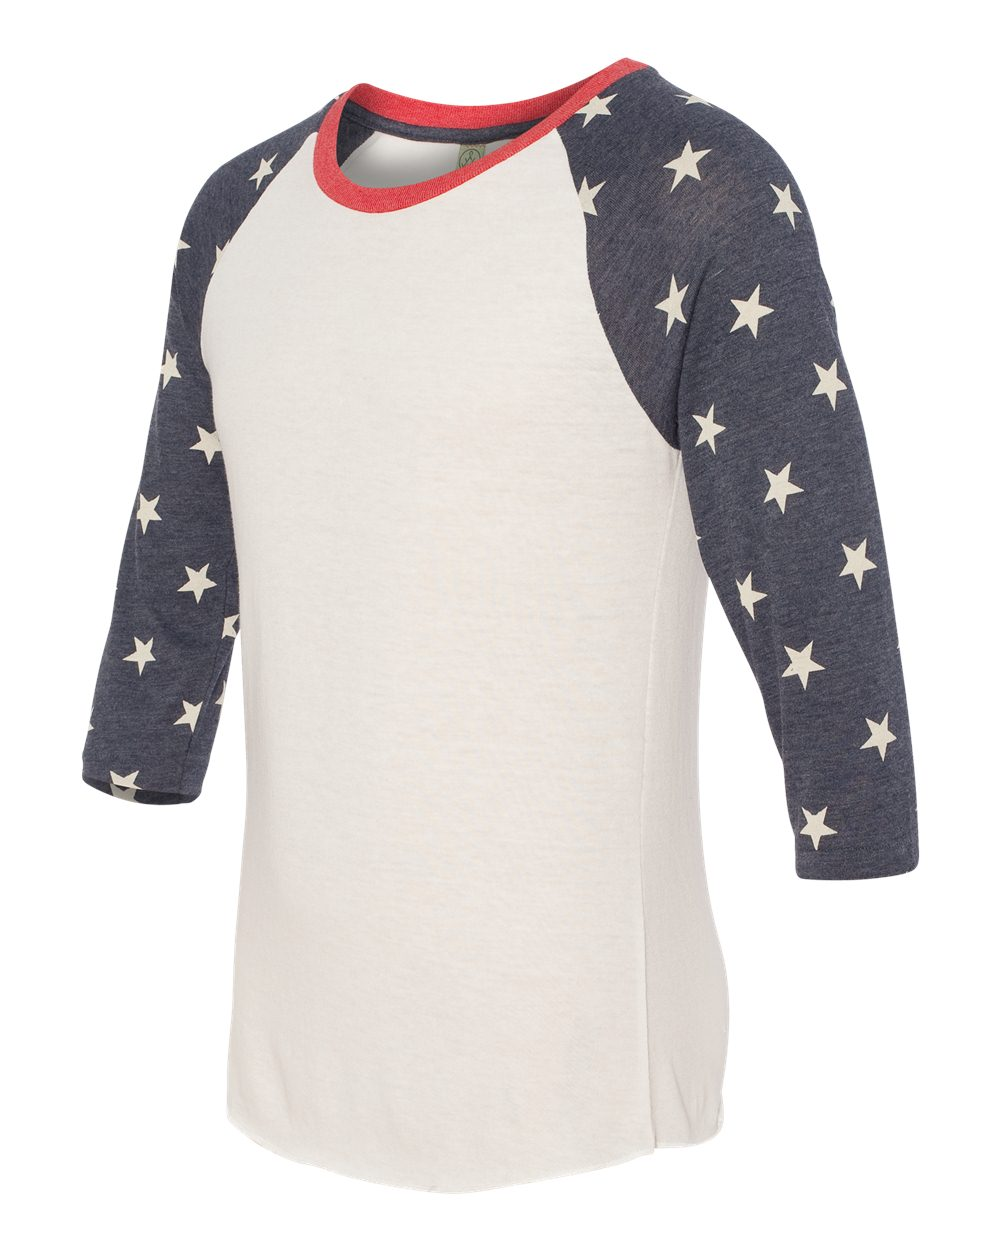 Alternative 2089ea printed eco jersey baseball raglan t for Sustainable t shirt printing